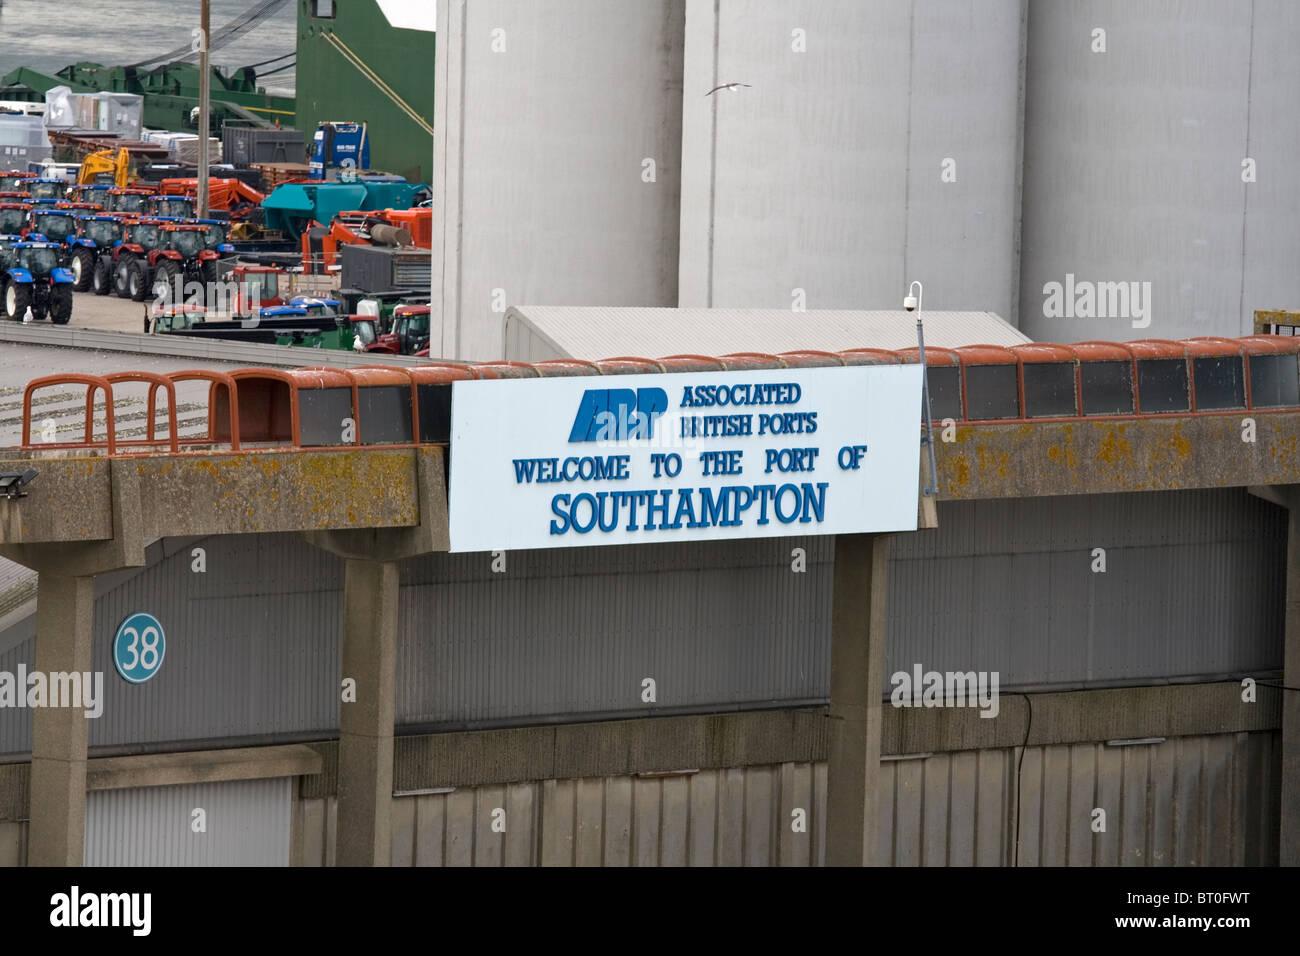 Port of Southampton, Associated British Ports - Stock Image